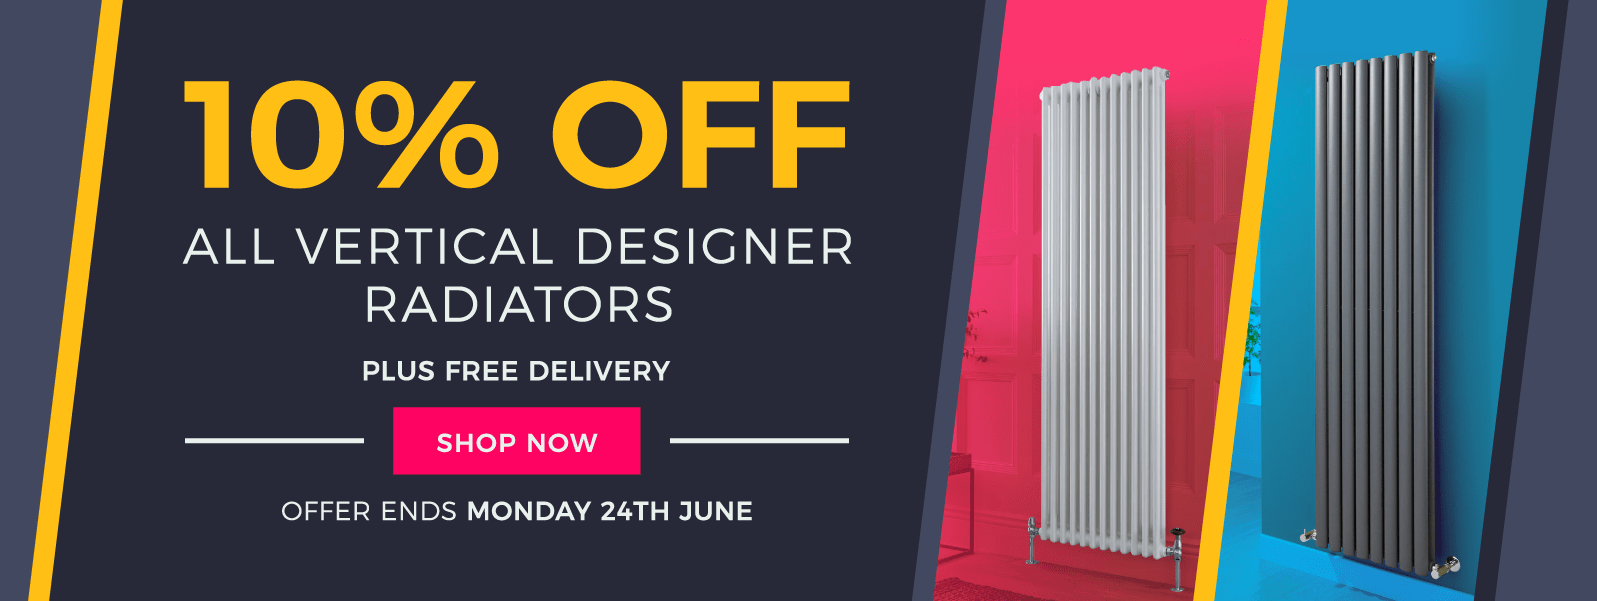 10% Off Vertical Designer Radiators - Plus Free Delivery - Offer Ends Monday 24th June